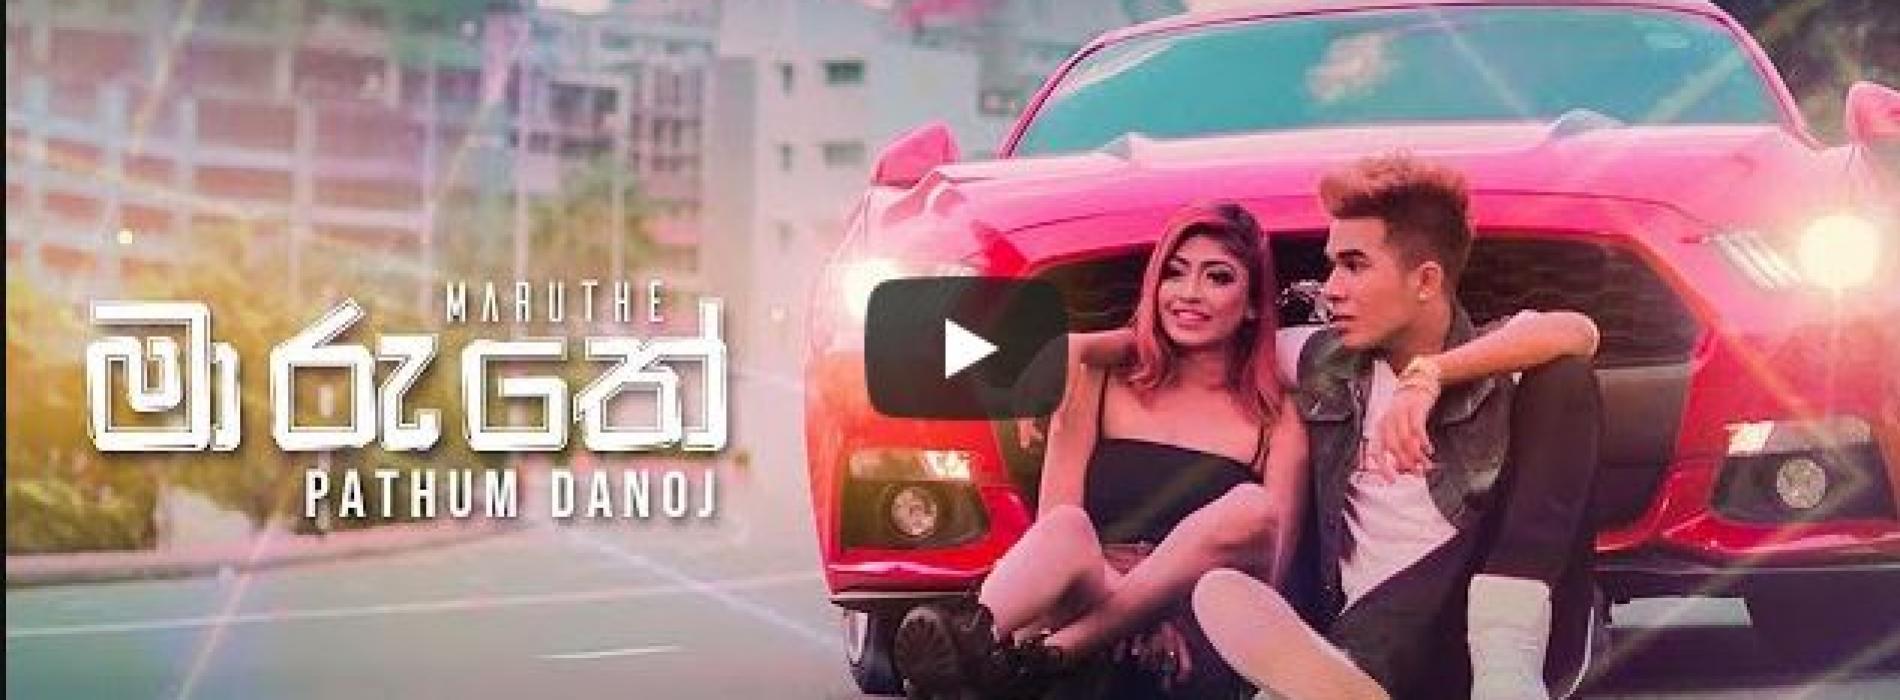 New Music : Maruthe – Local Justin ( Pathum Danoj )